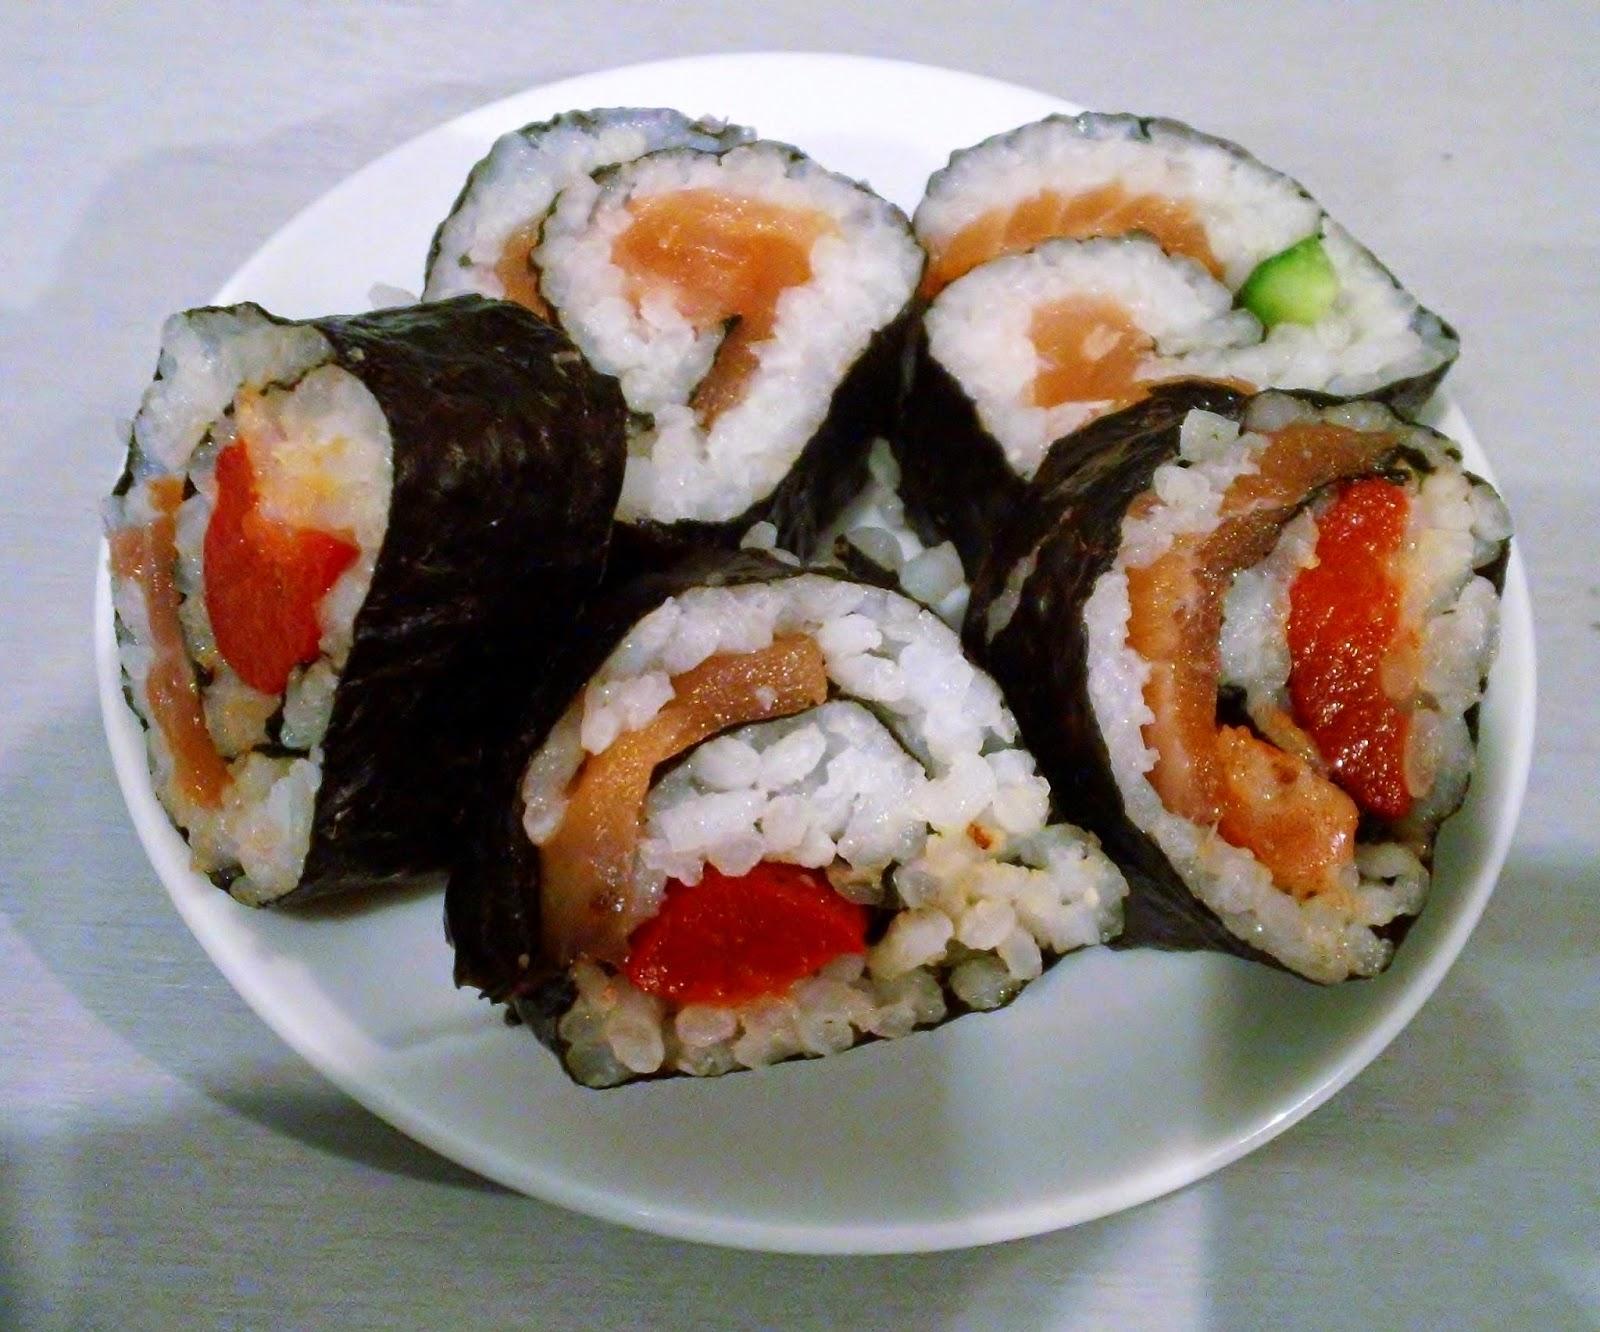 Homemade Sushi using Yutaka Sushi Kit, Yukata Sushi Kit, Salmon Sushi, Sushi at Home